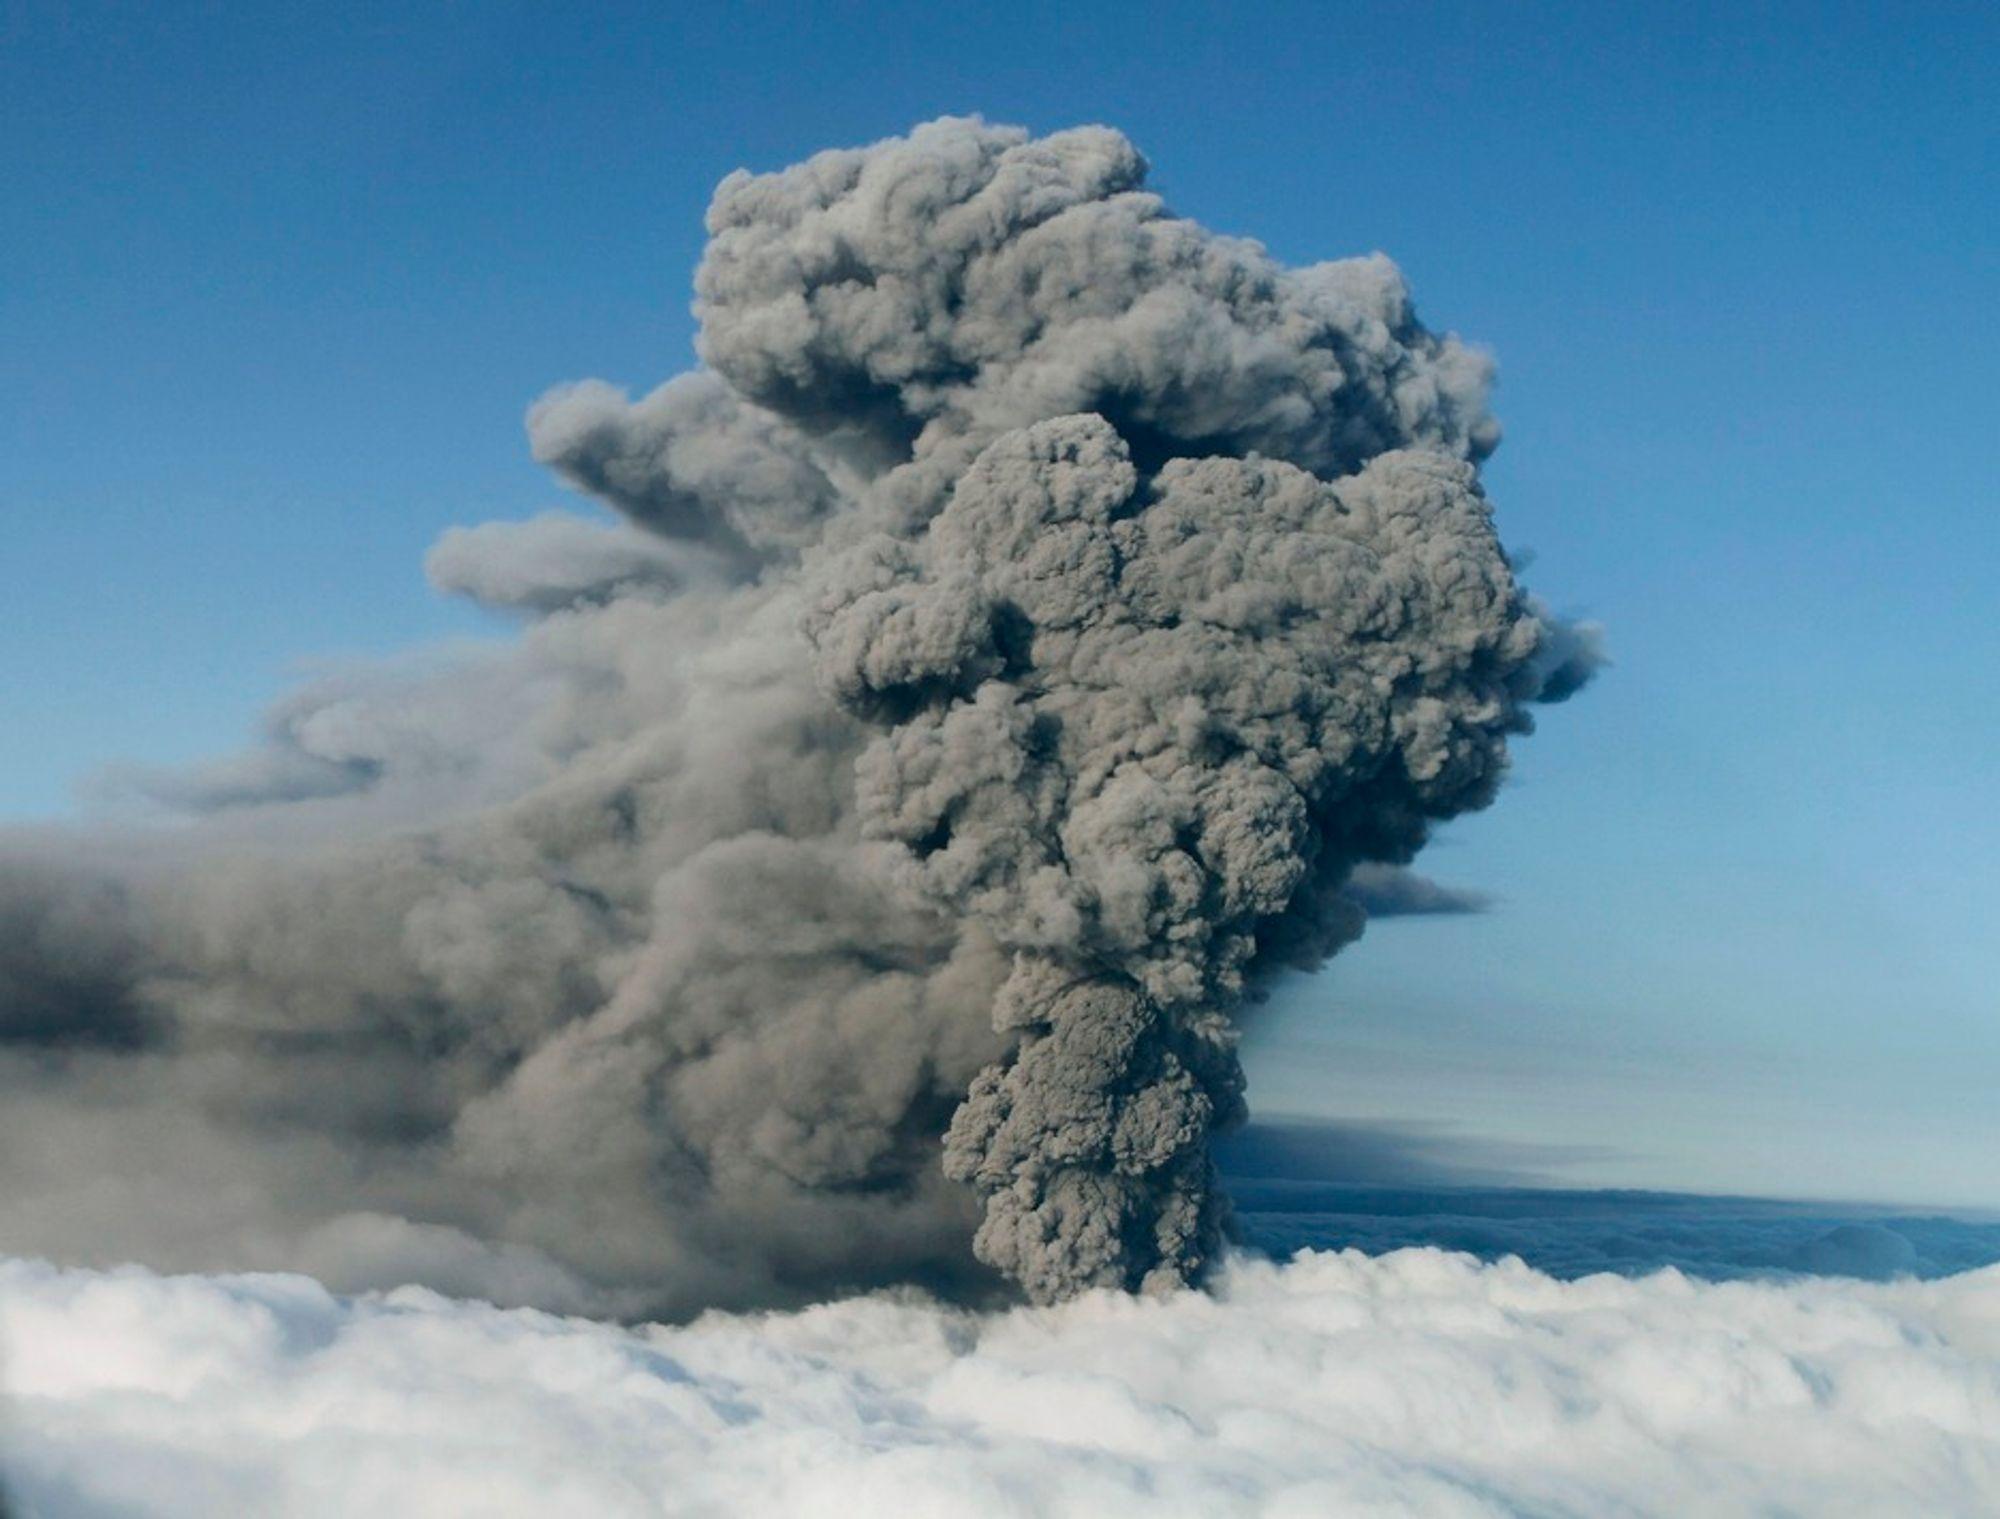 Vulkanen under isbreen Eyjafjallajökull har også denne uka spydd ut aske. Bildet er tatt mandag.